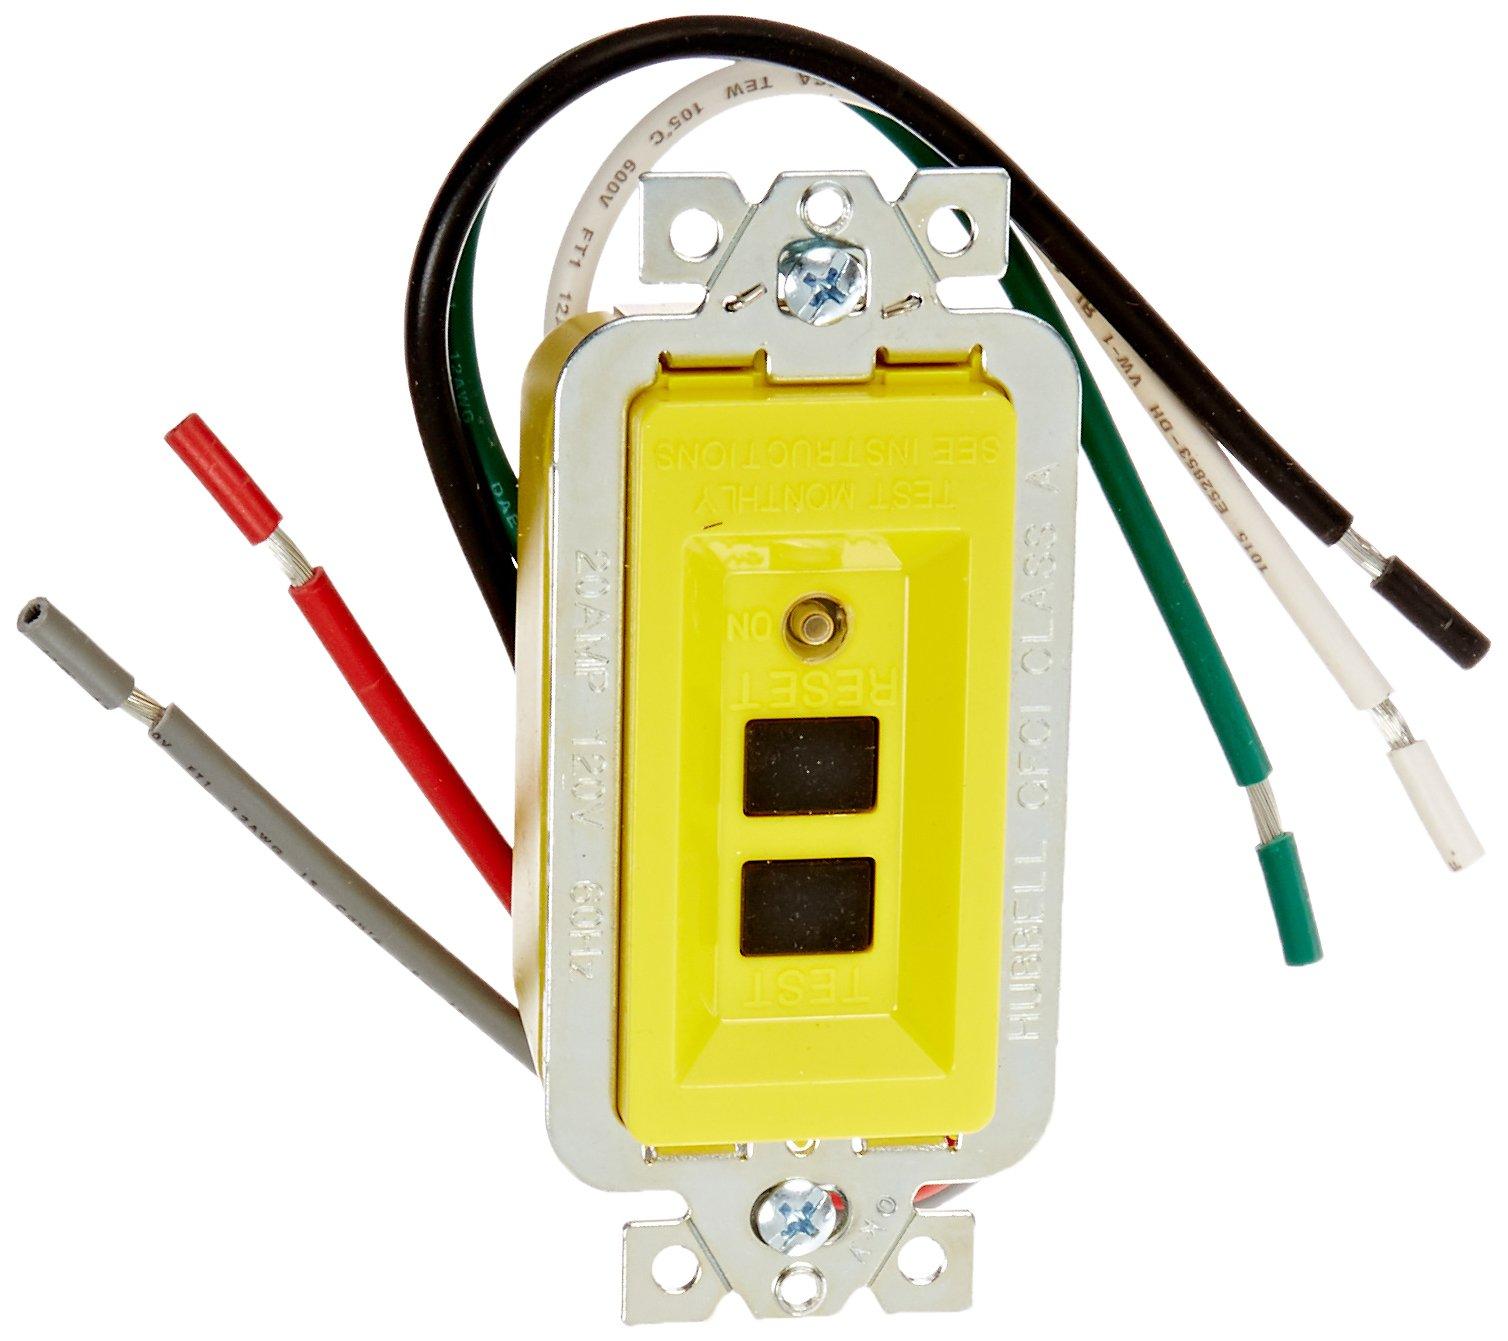 Hubbell GFM20 GFCI Module, 20 amp, 120V, Yellow